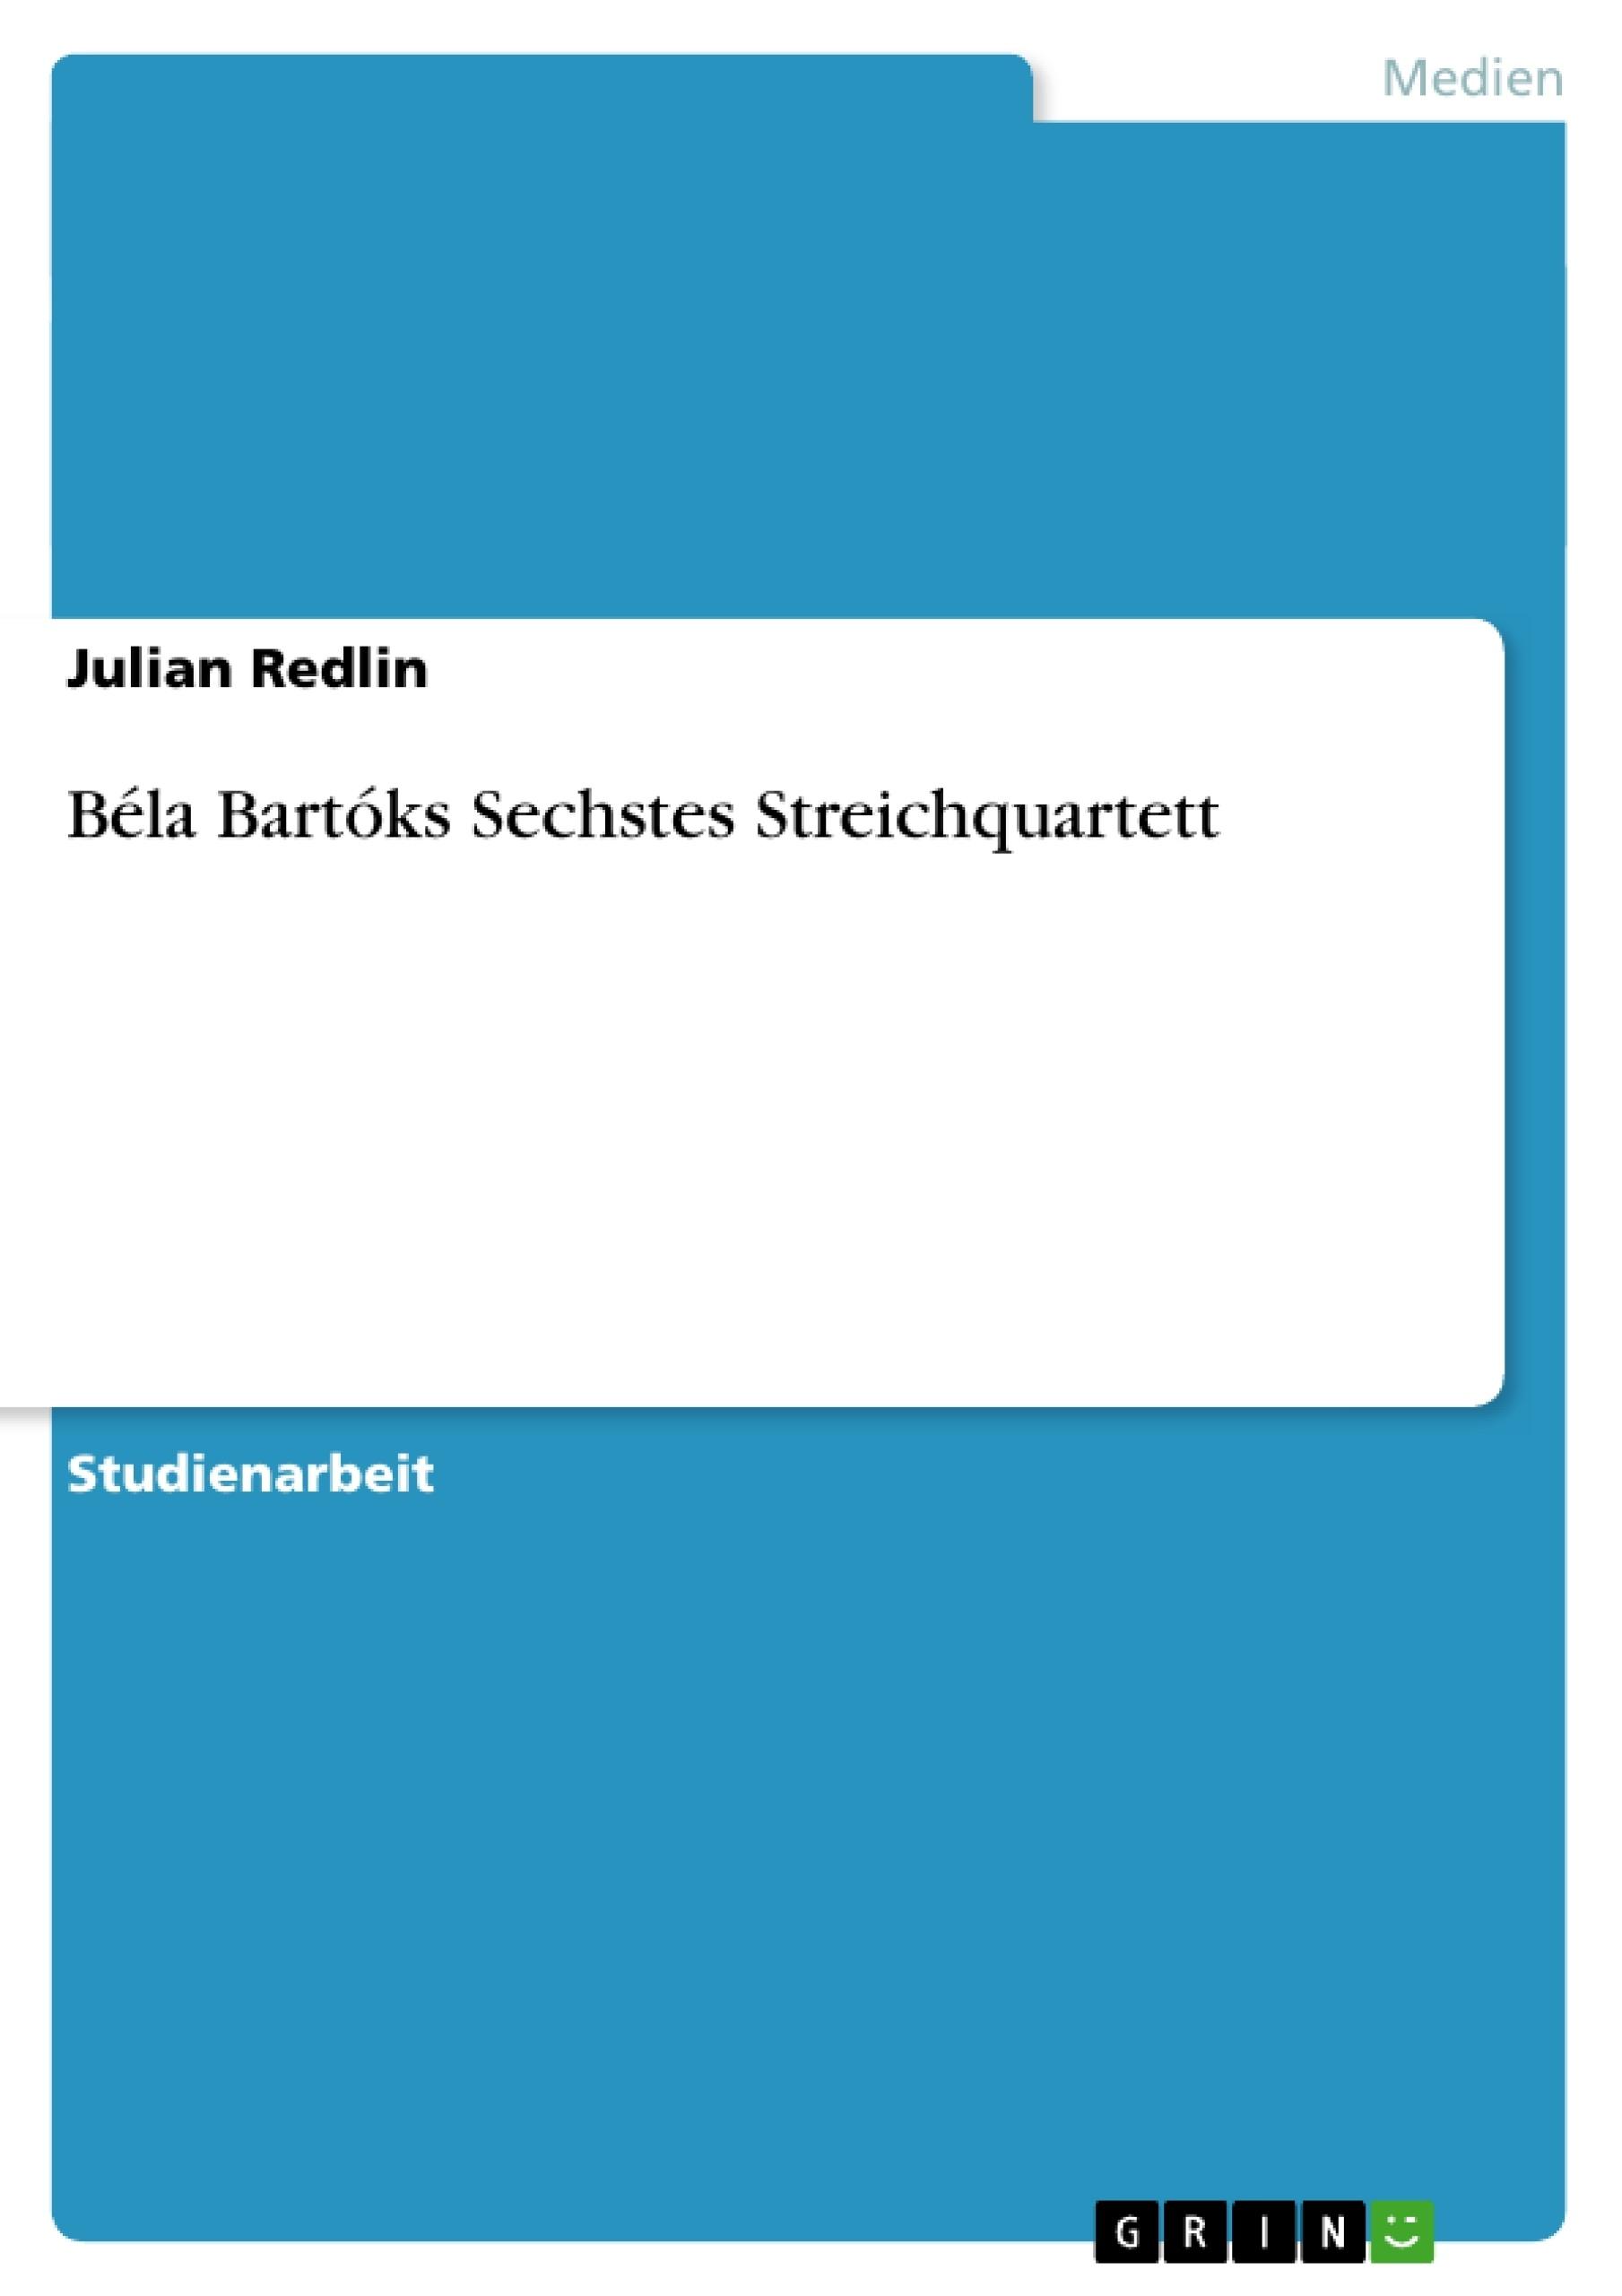 Titel: Béla Bartóks Sechstes Streichquartett